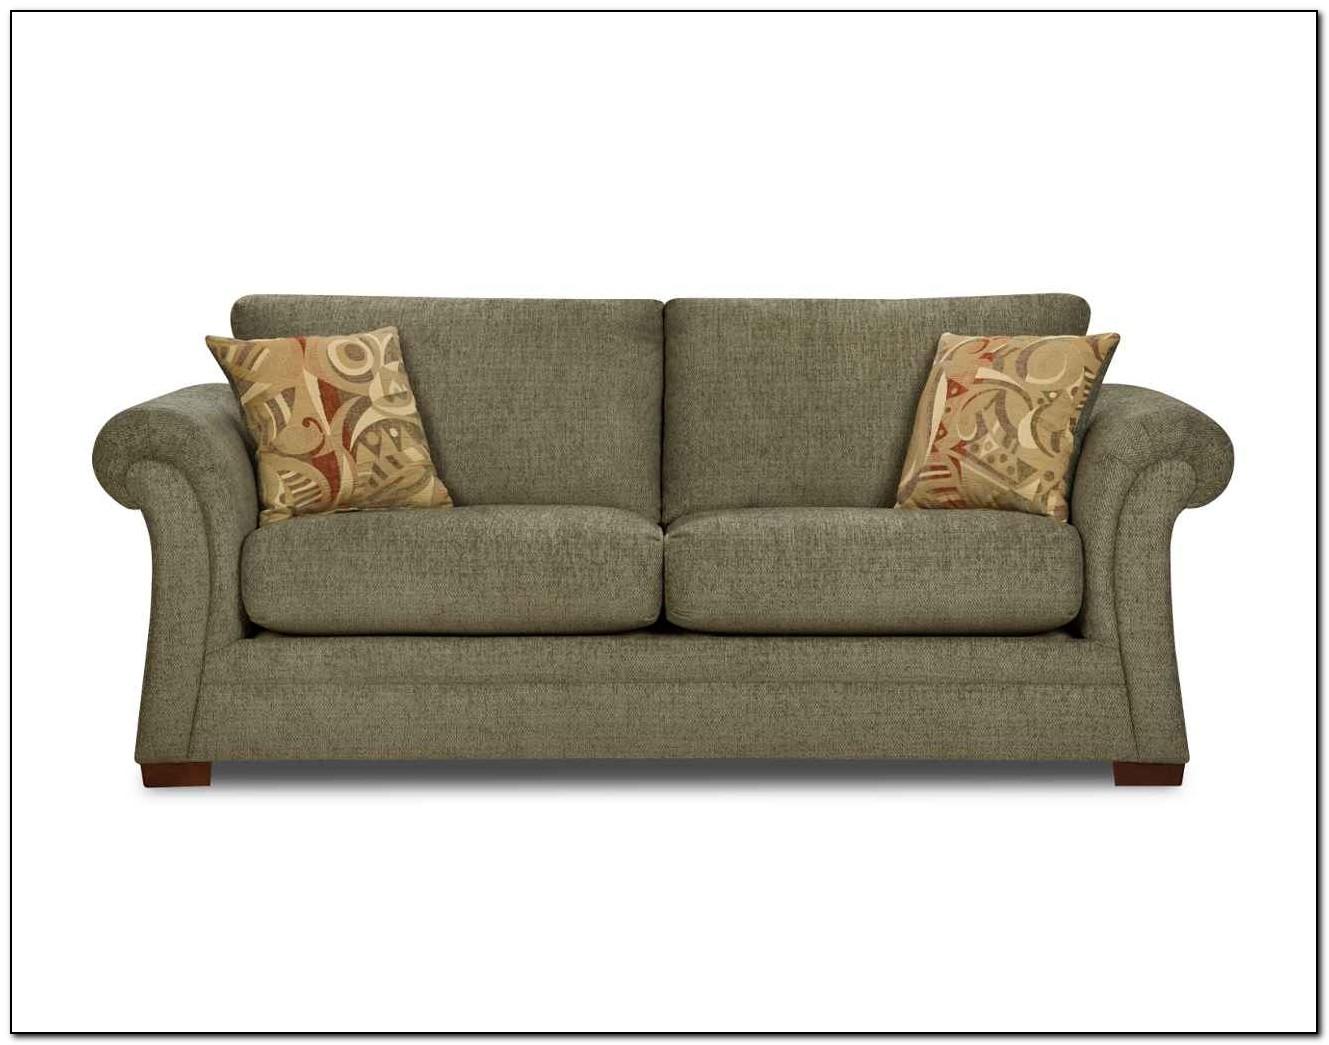 loveseat sleeper sofas cheap sofa home design ideas drdknrknwb14413. Black Bedroom Furniture Sets. Home Design Ideas